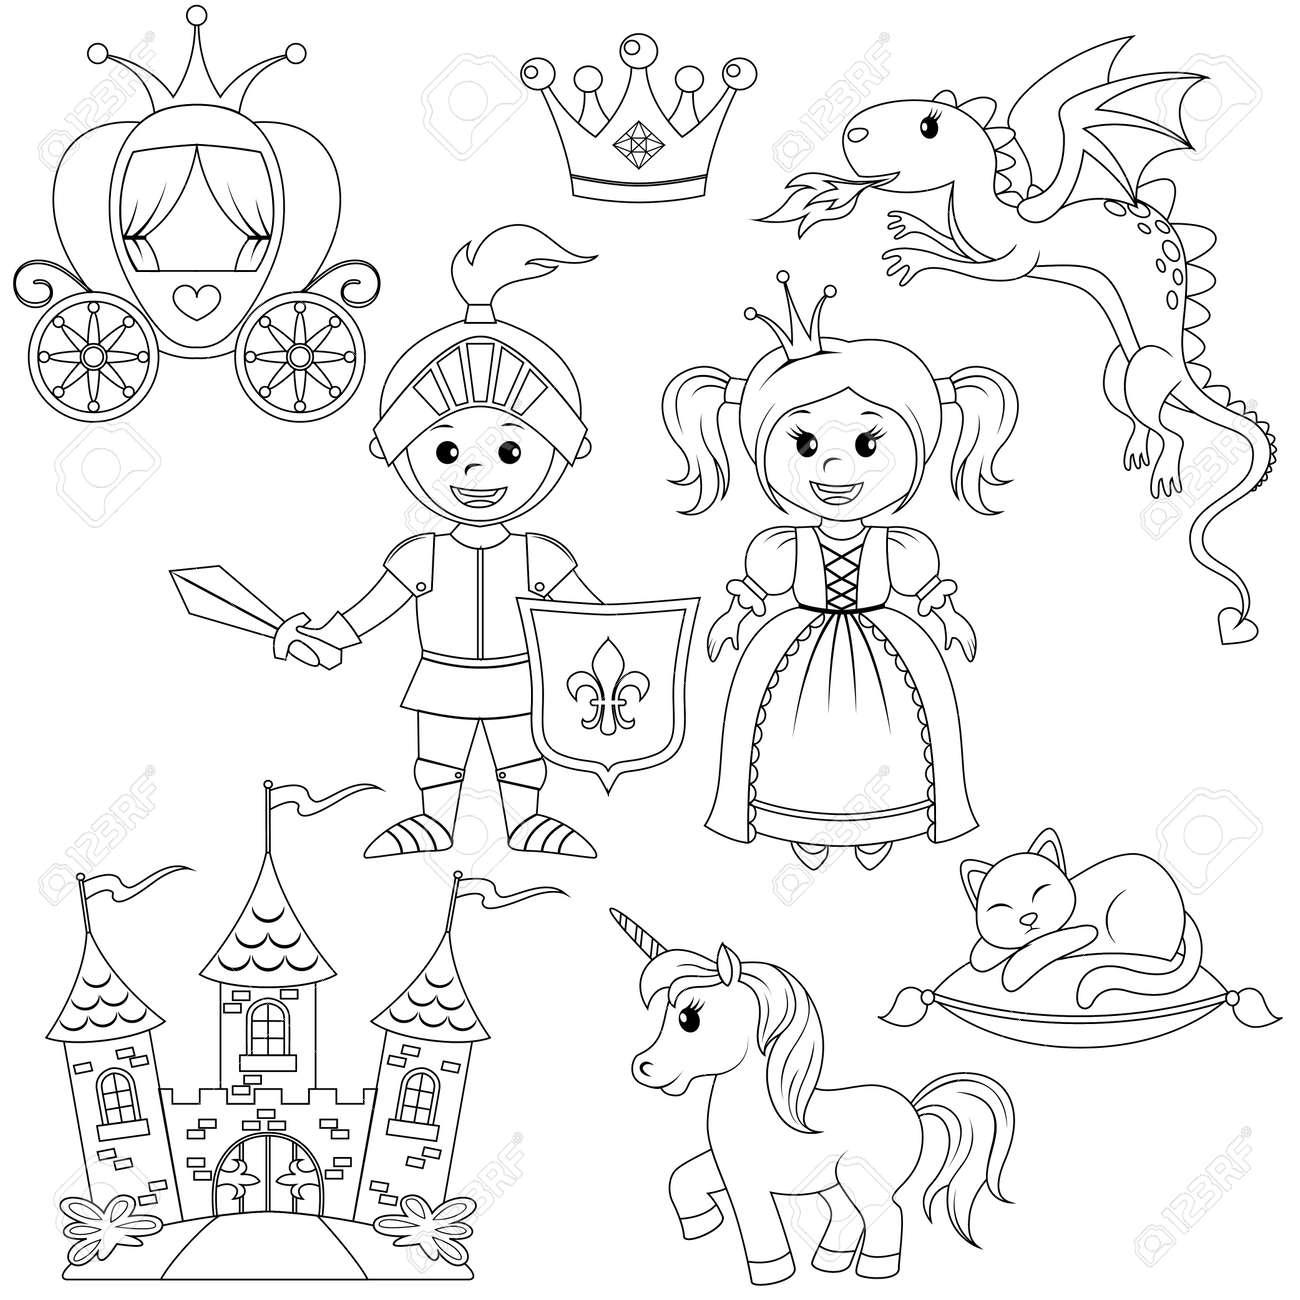 Fairytale Prenses Knight Kale Araba Tek Boynuzlu At Taç